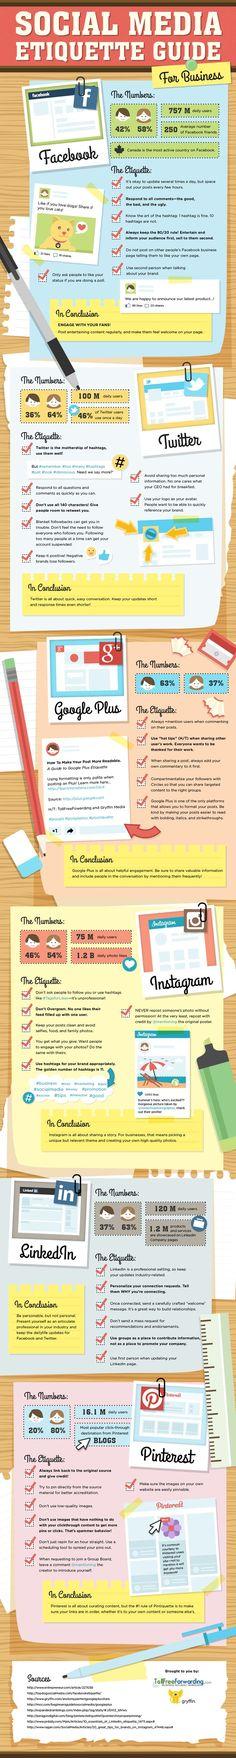 #Socialmedia Etiquette Guide #infographic